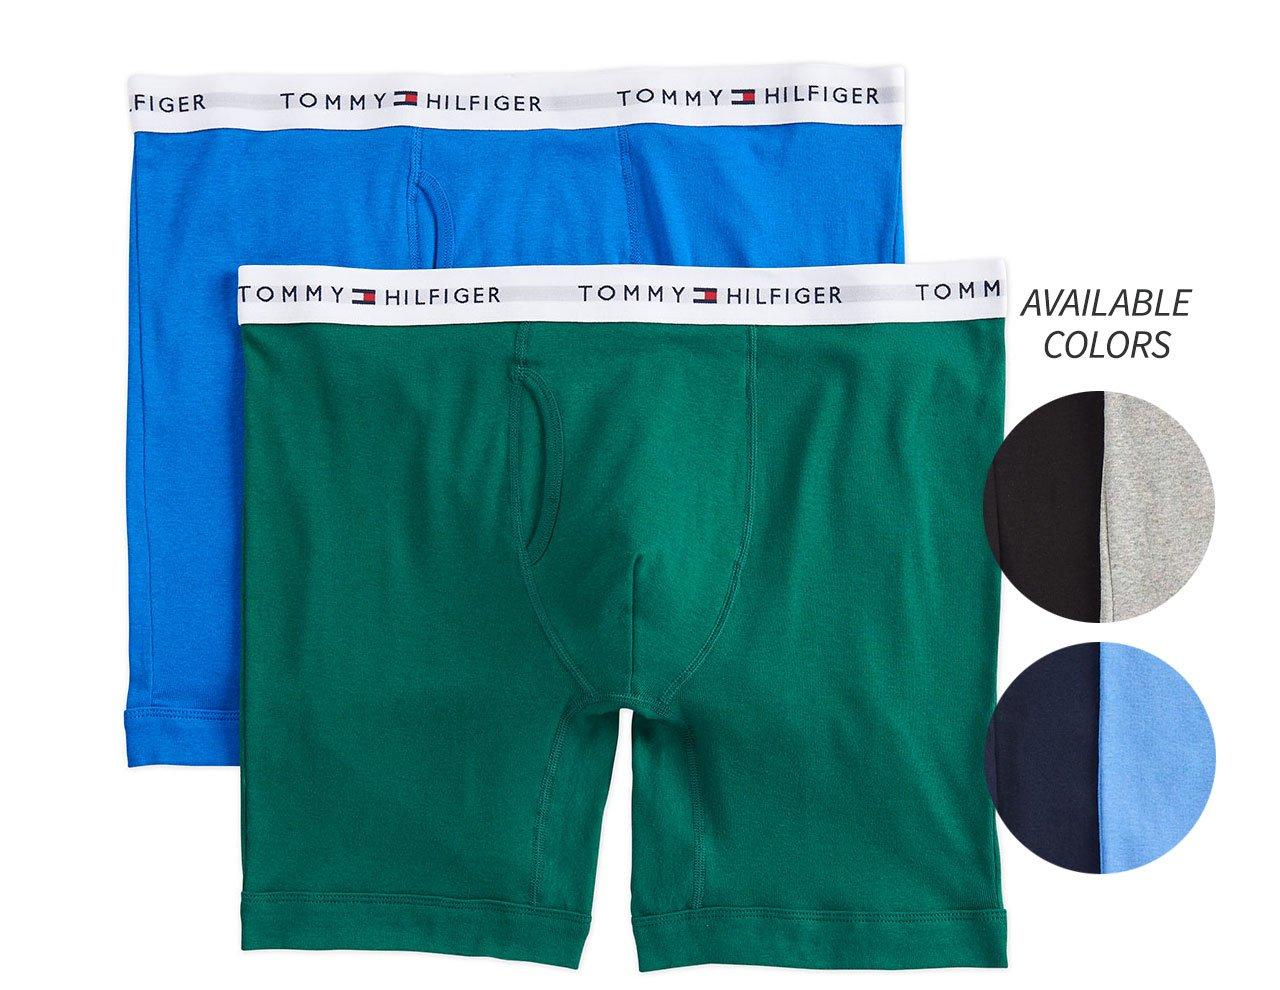 big and tall tommy hilfiger underwear